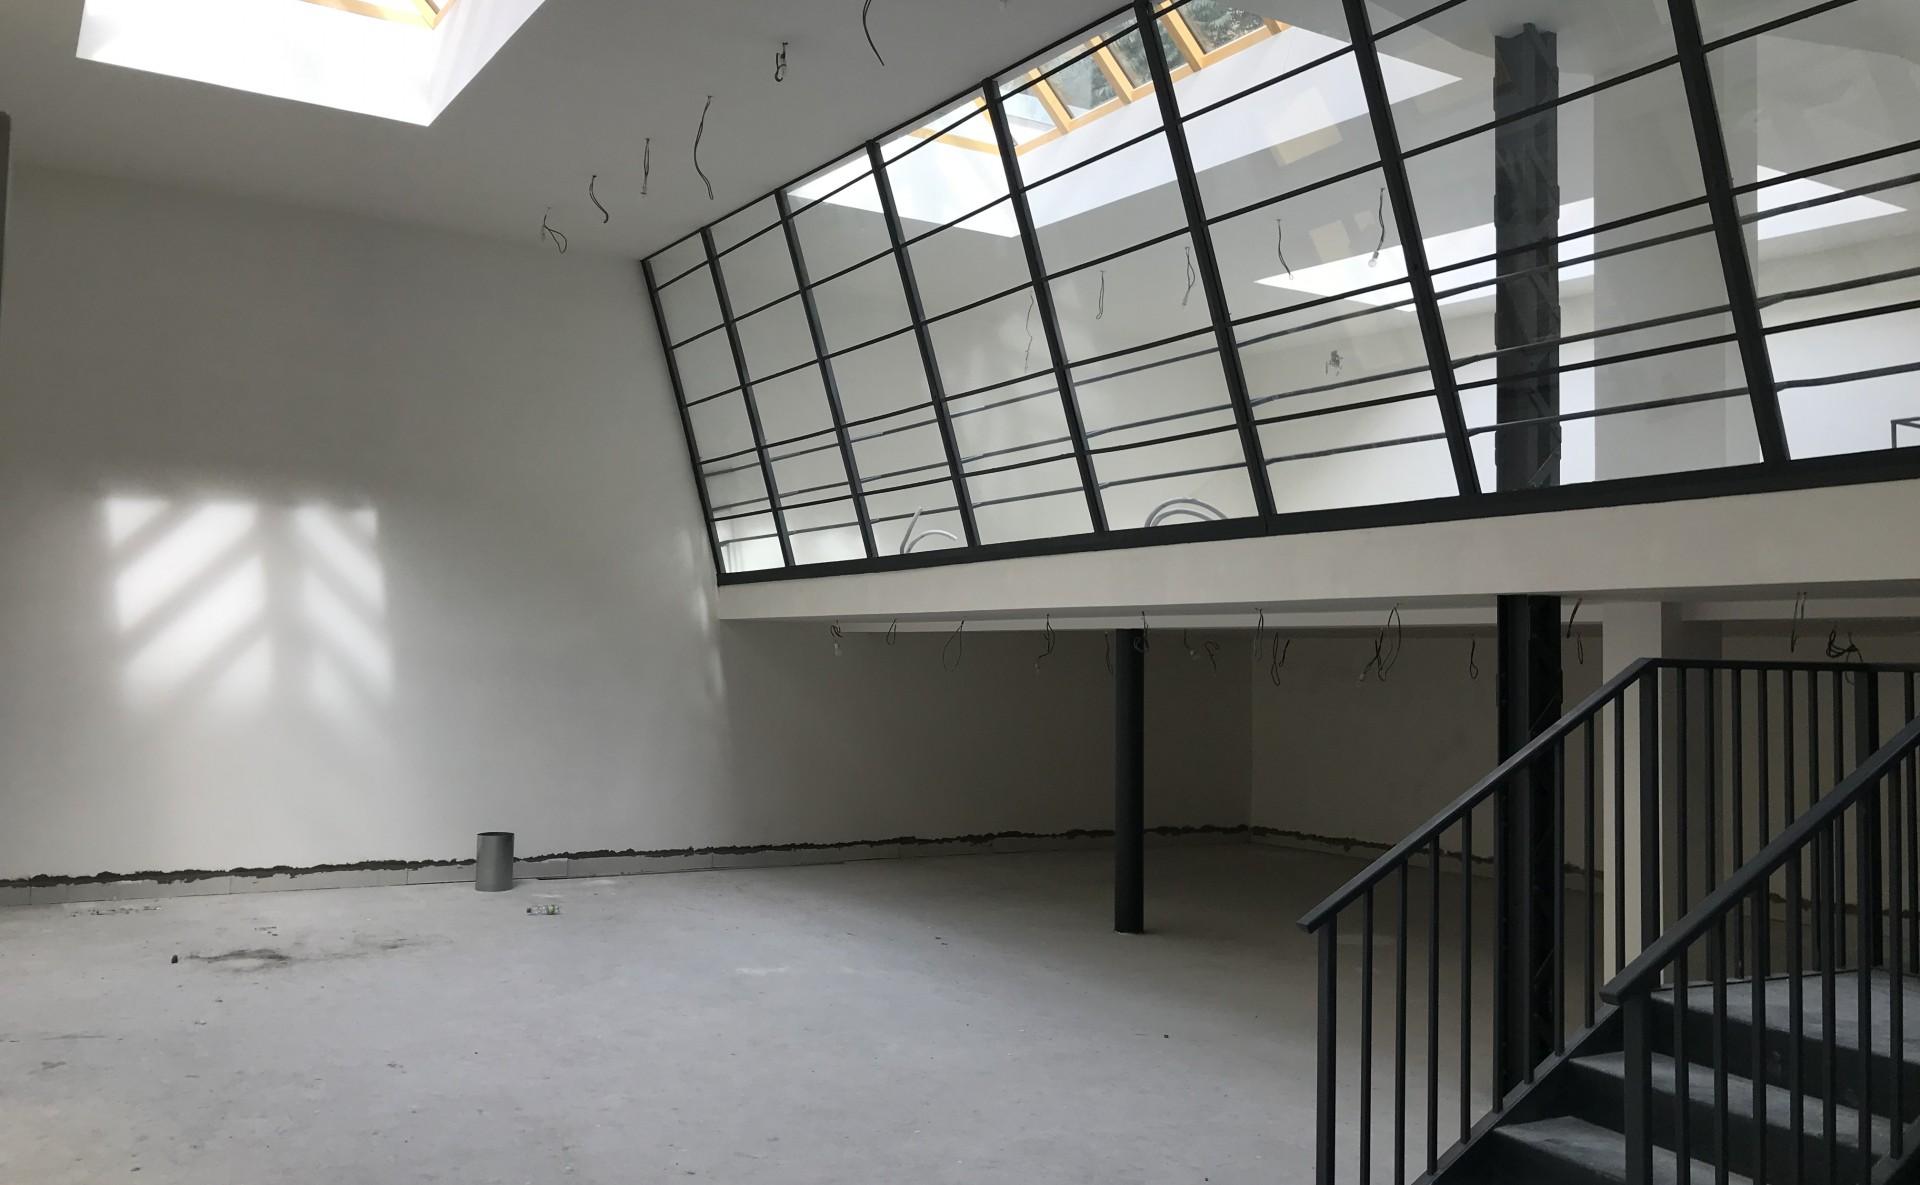 Kancelář atelier Praha 1, Opletalova ulice